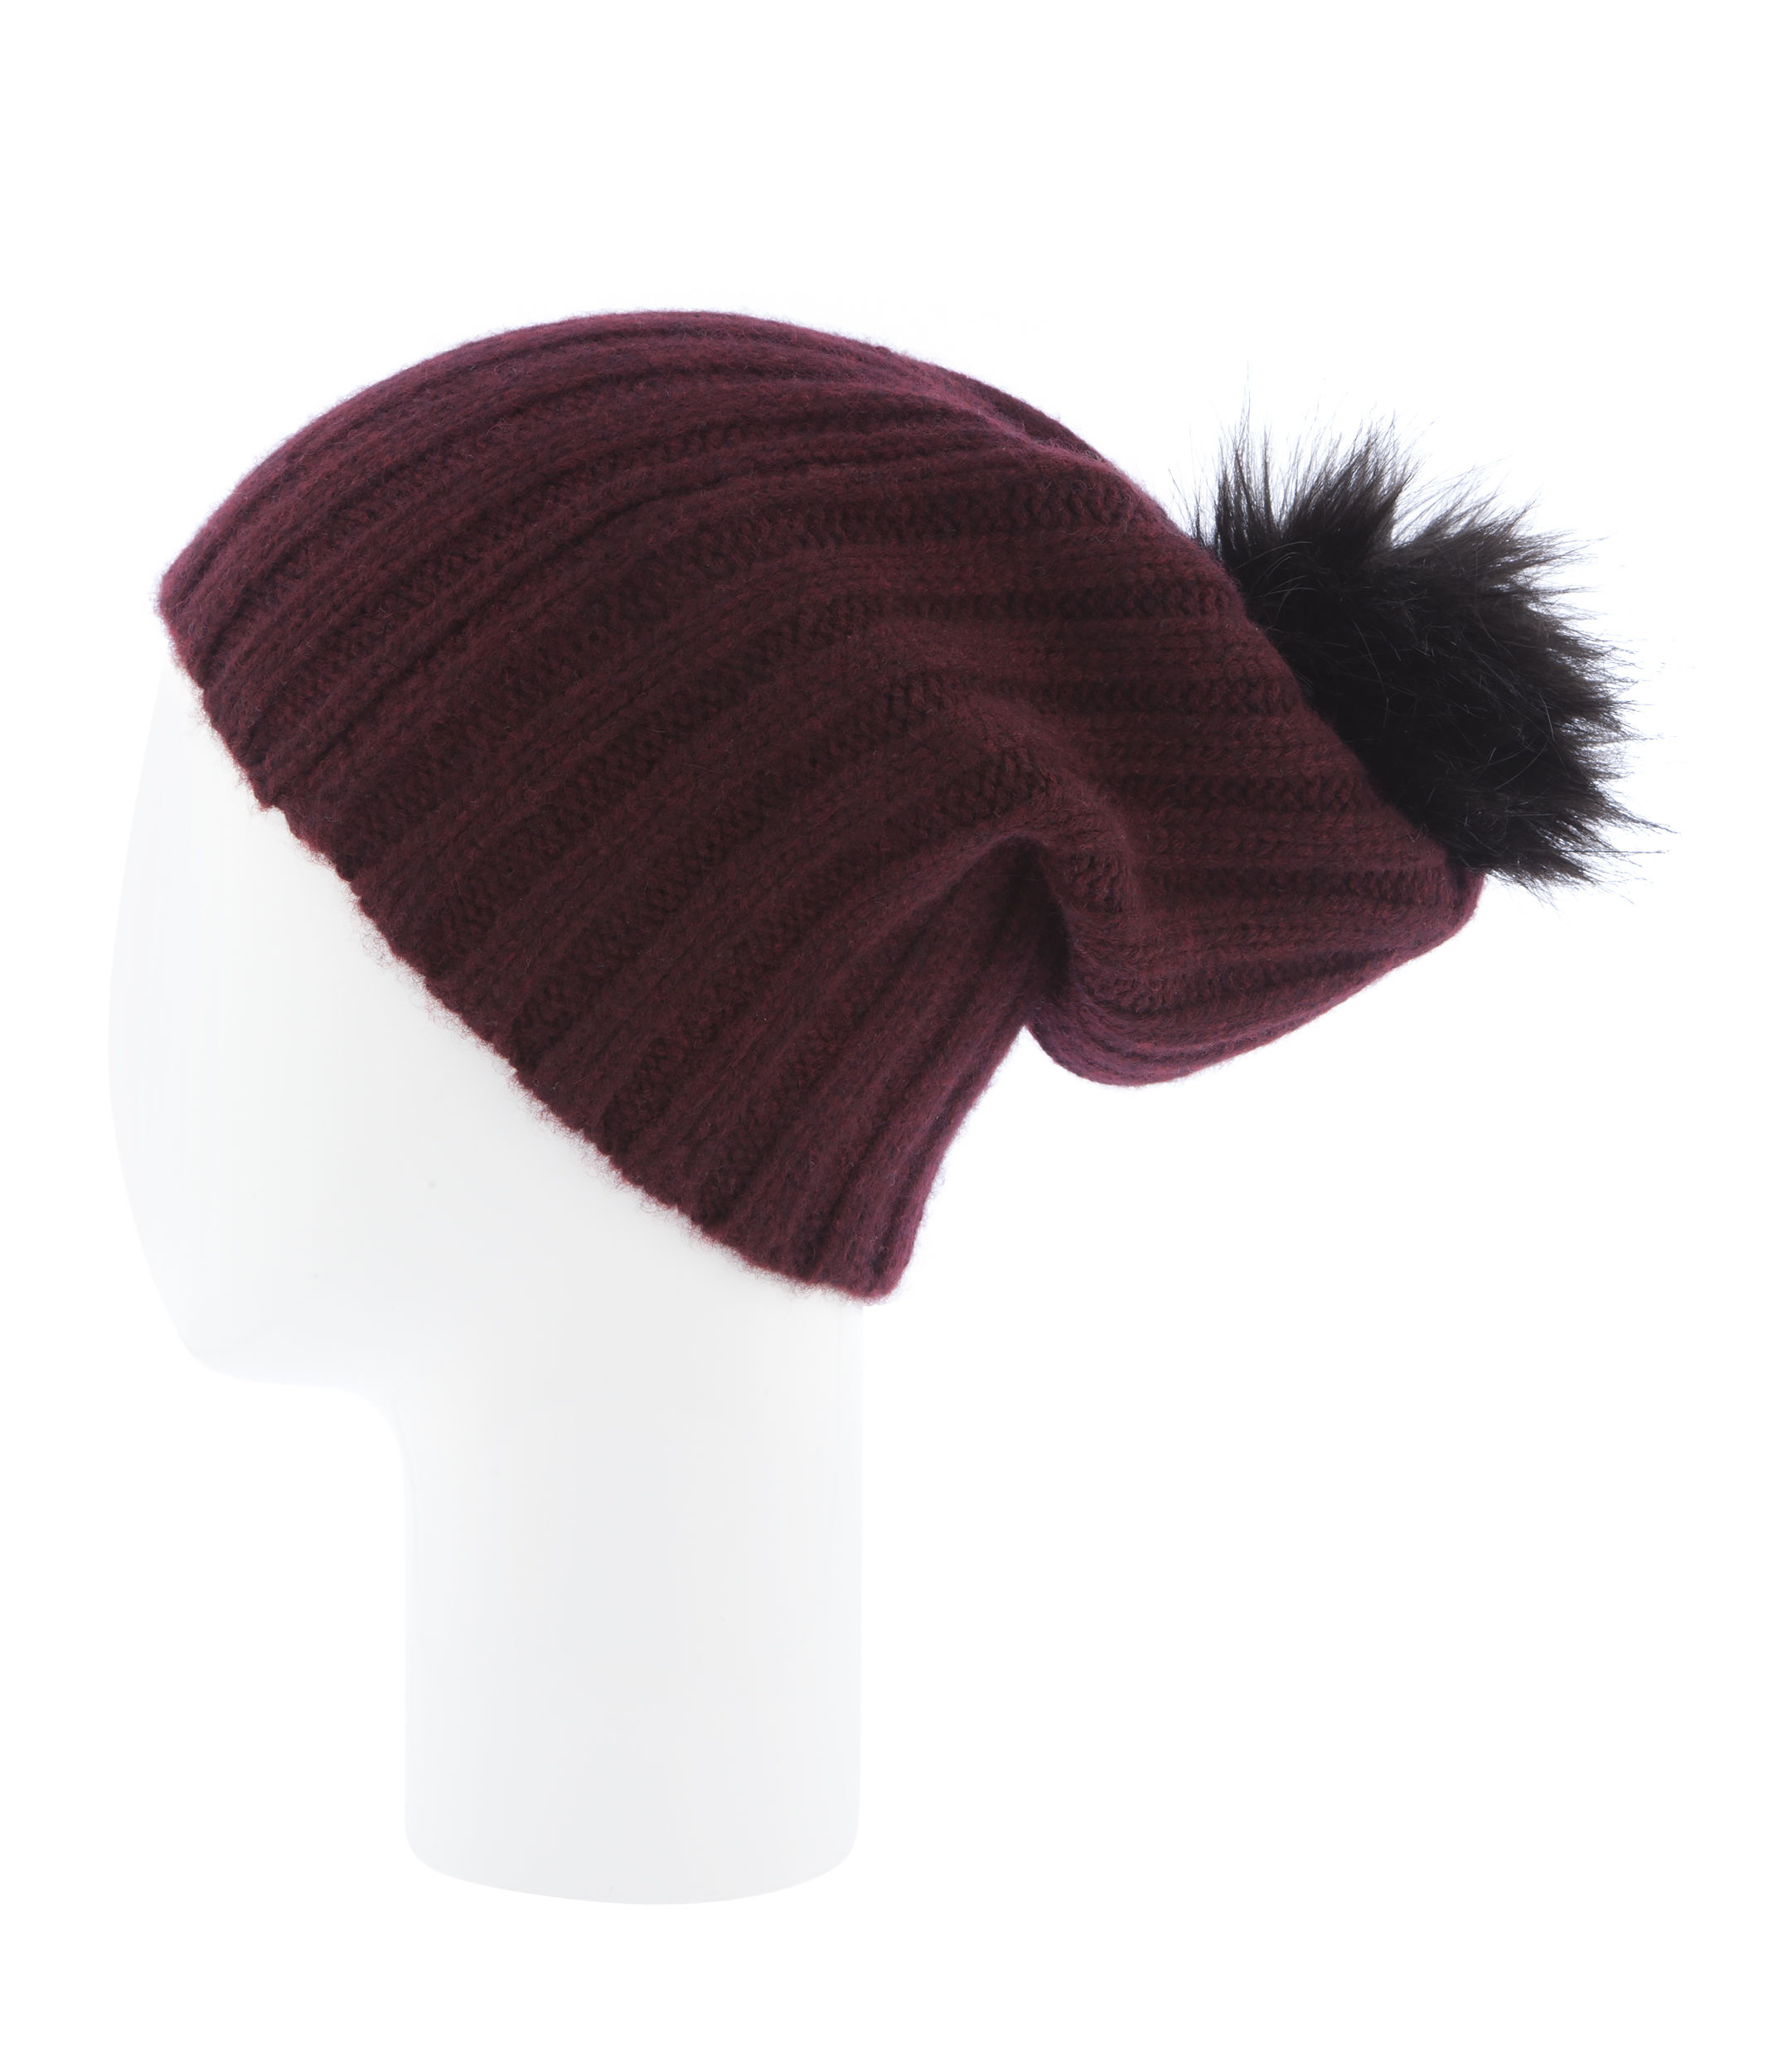 d3e18b42ecc Lyst - Henri Bendel Pom-pom Cashmere Ribbed Hat in Purple